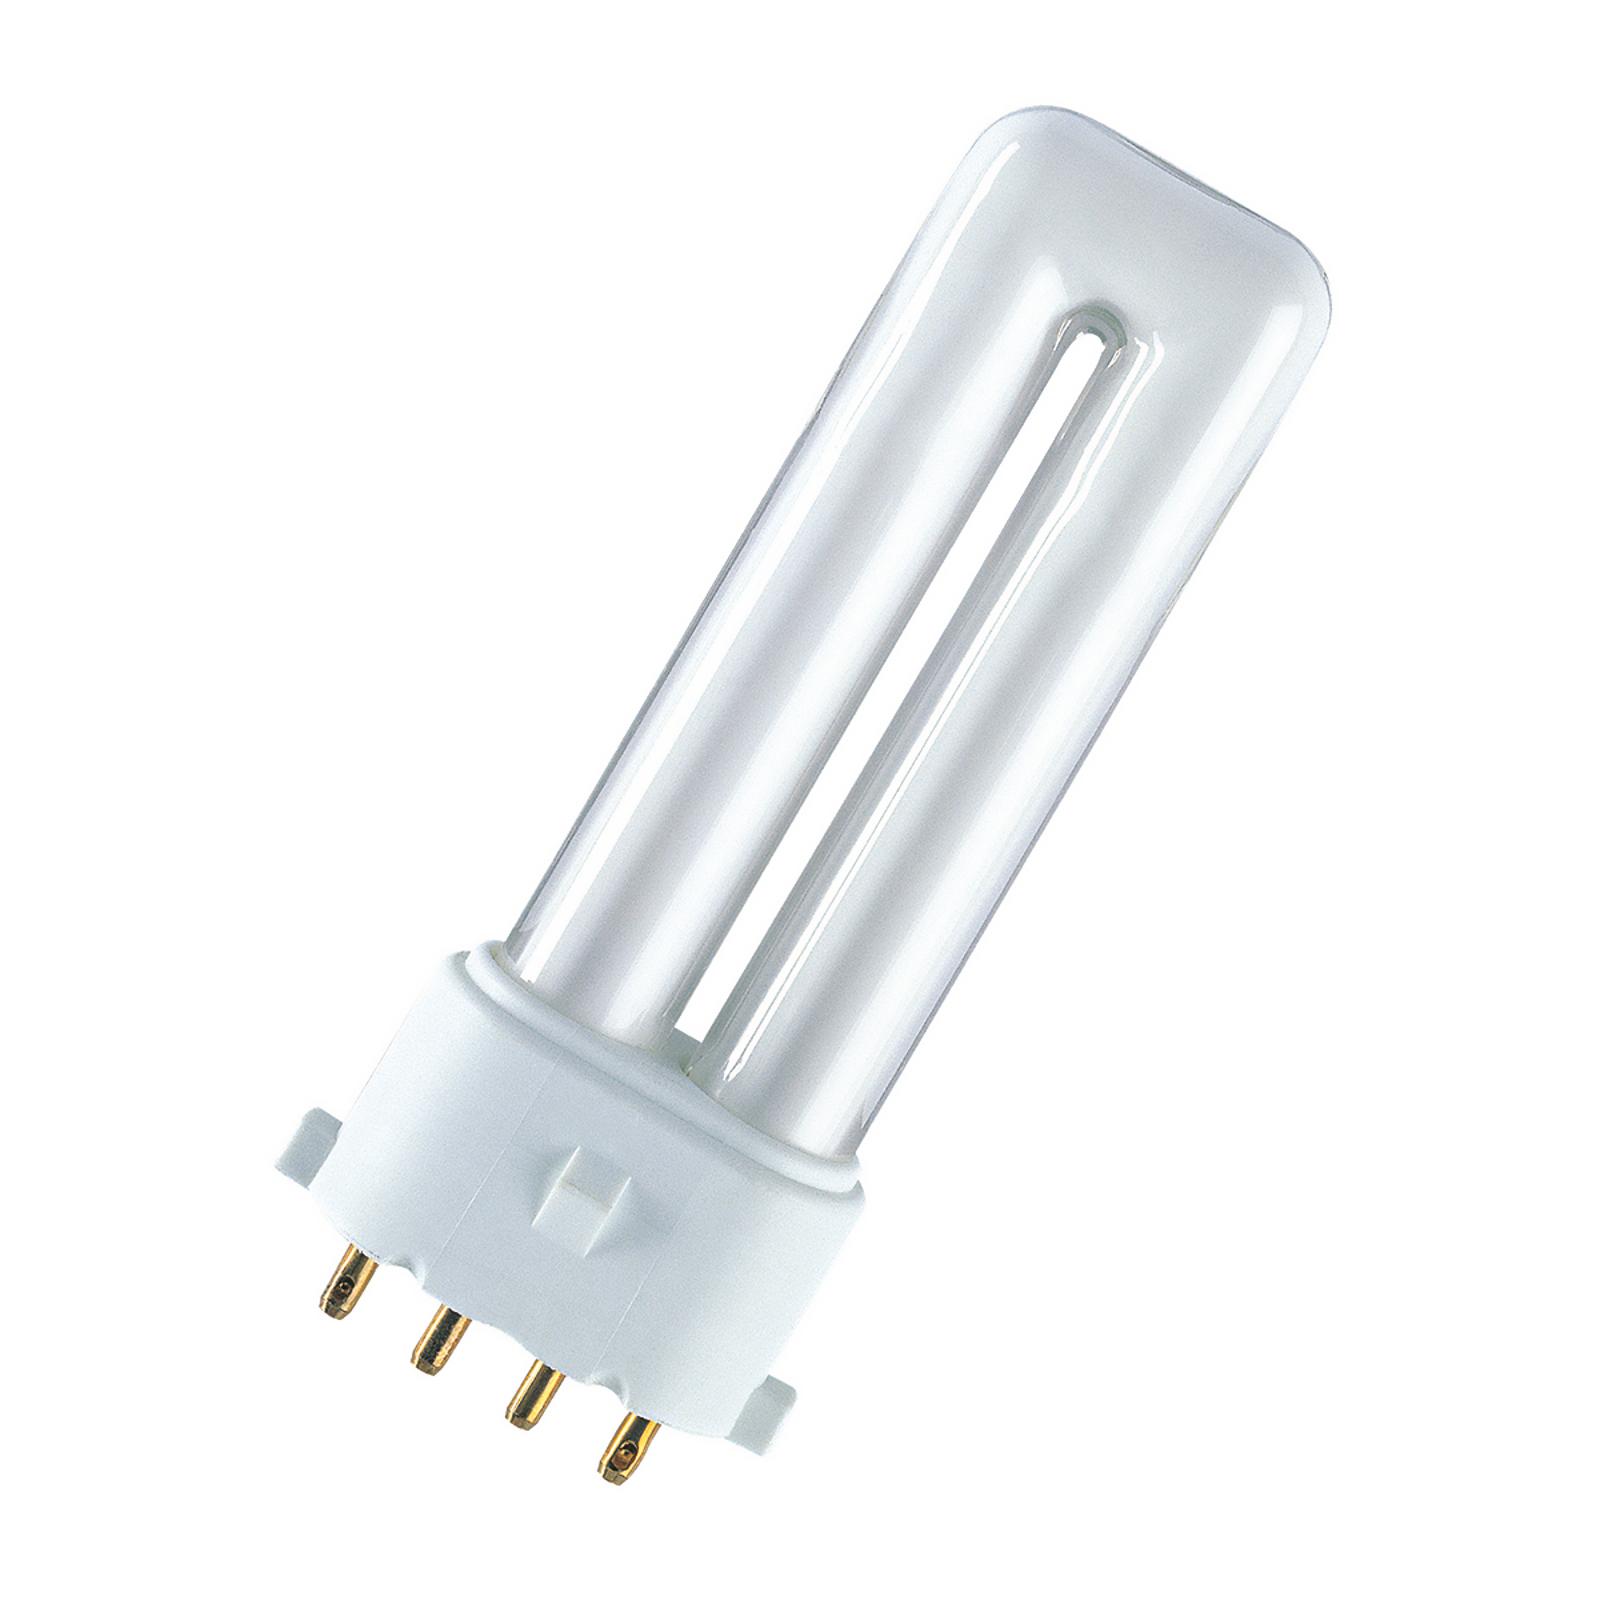 2G7 9W Kompaktleuchtstofflampe Dulux S/E